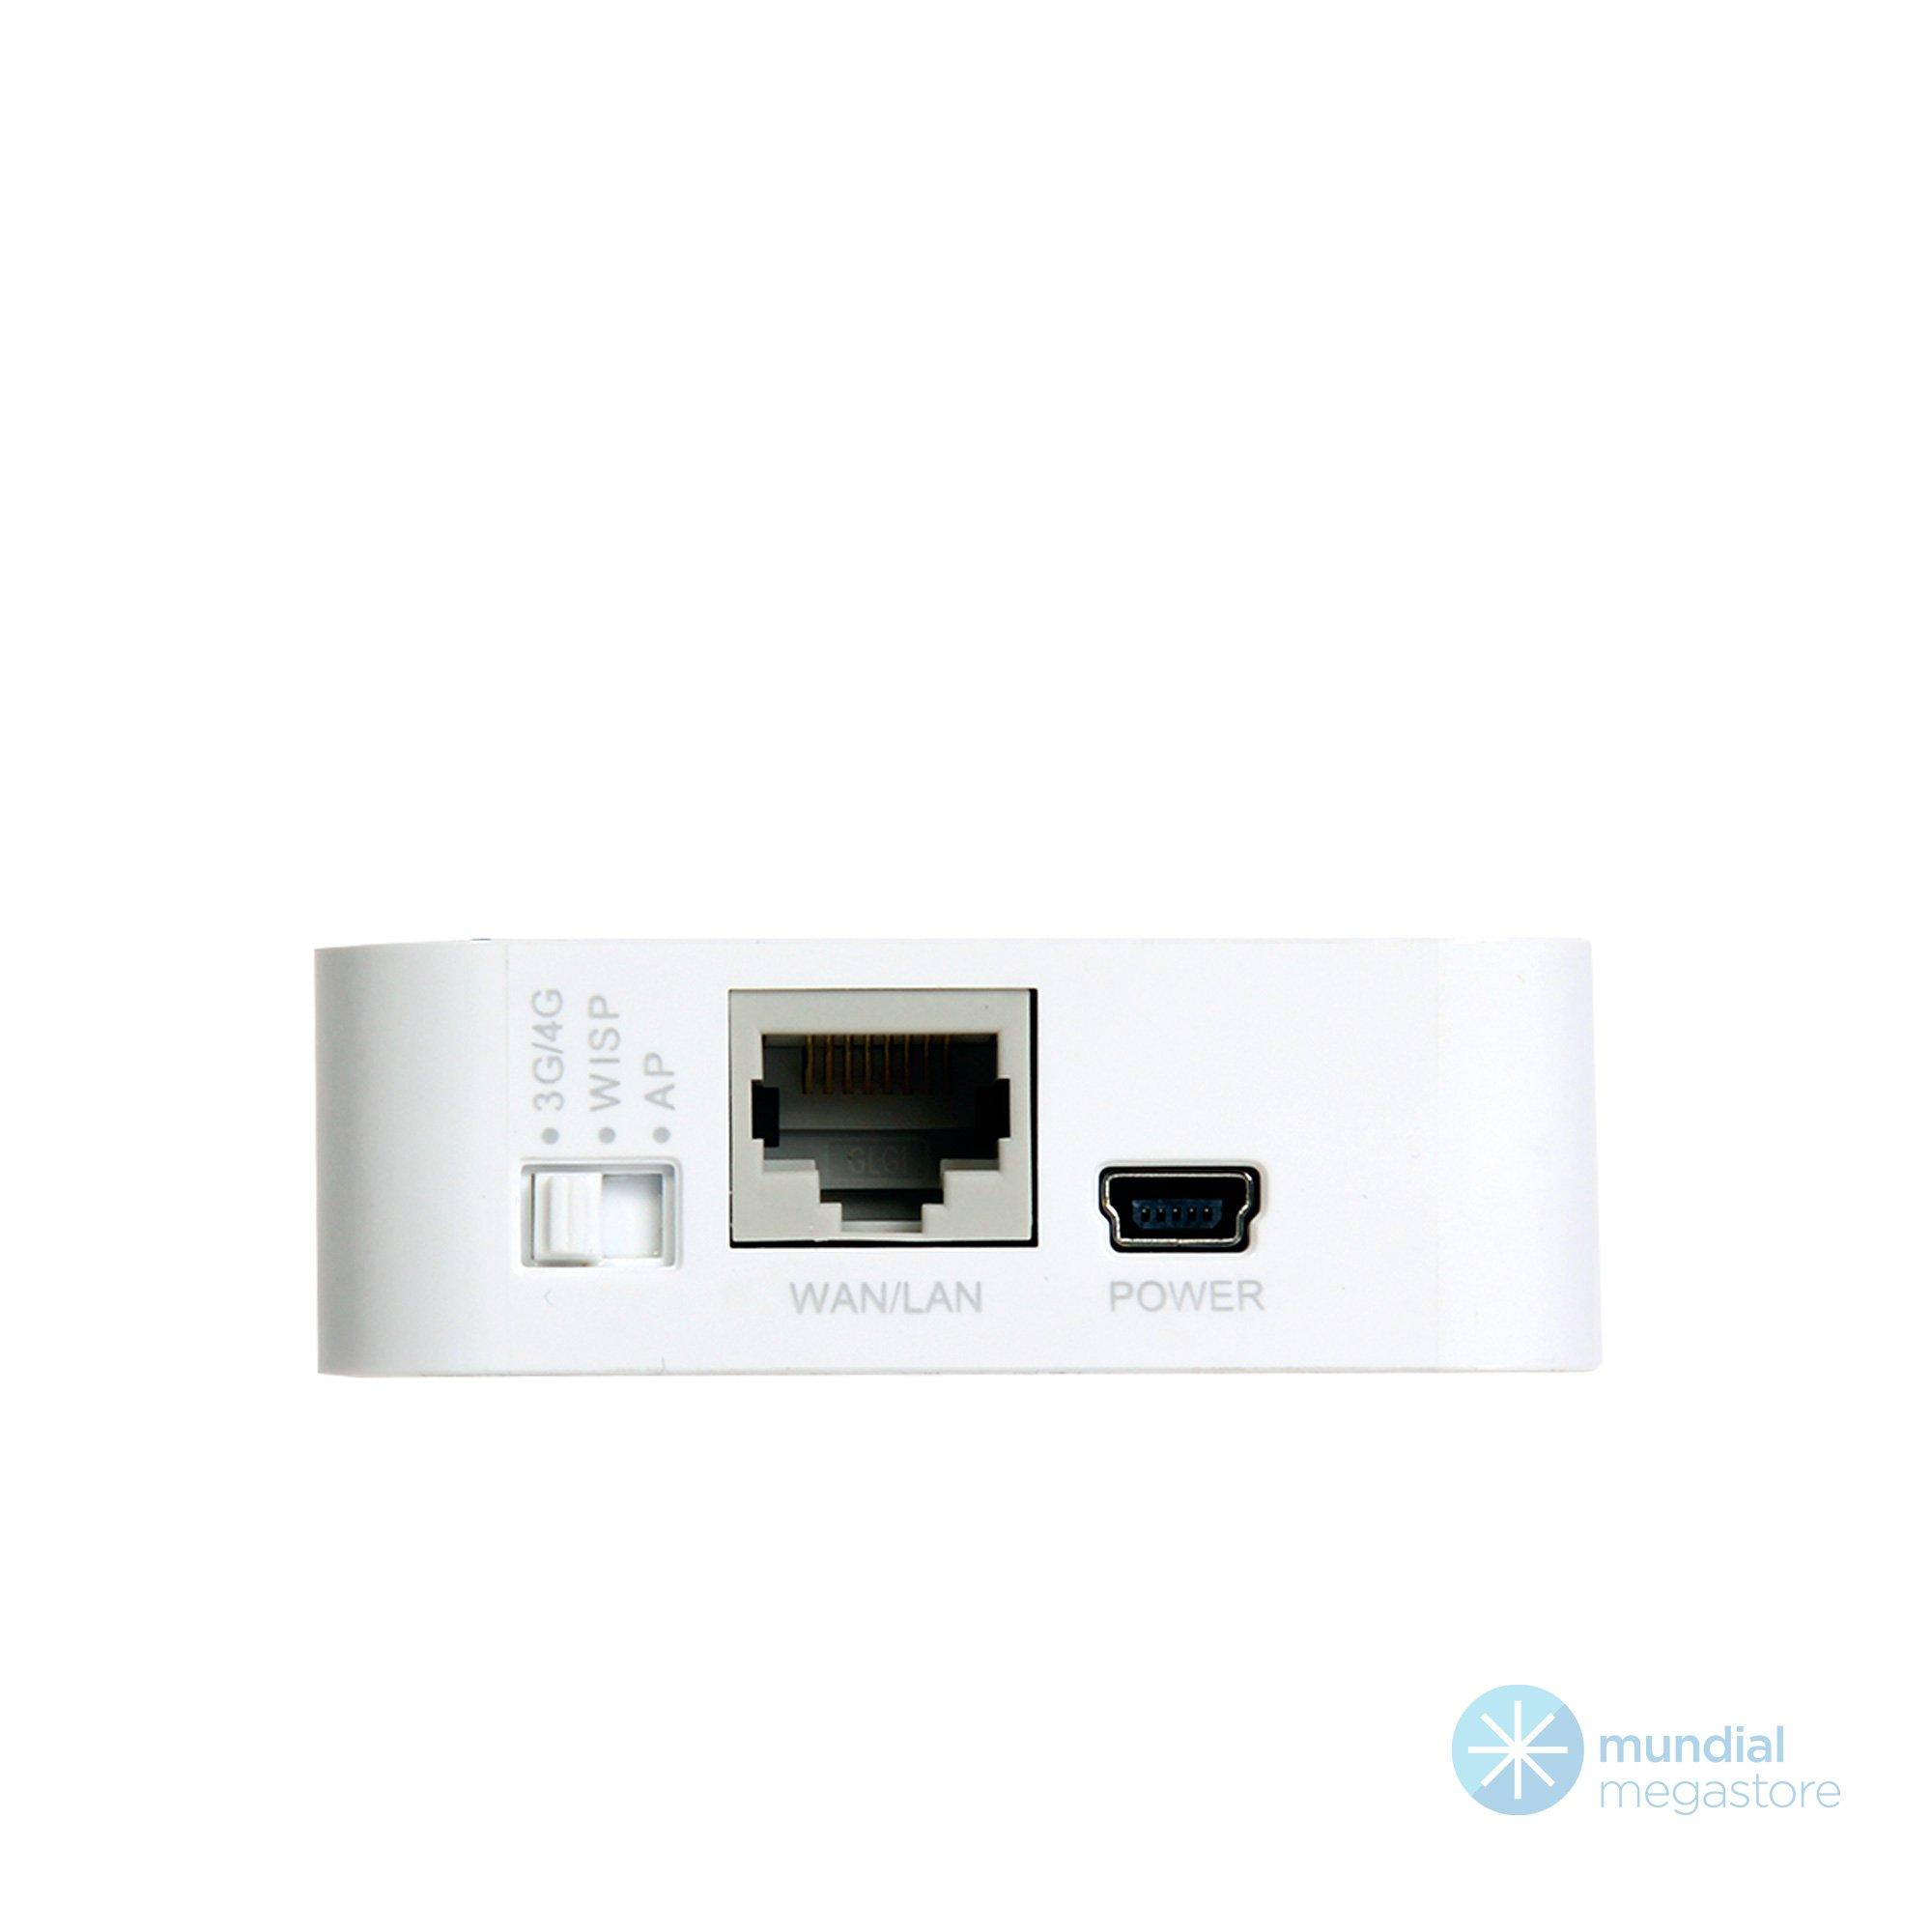 wireless mini roteador portatil 3g 4g tp link tl mr3020 150mbps 45095 2000 195975